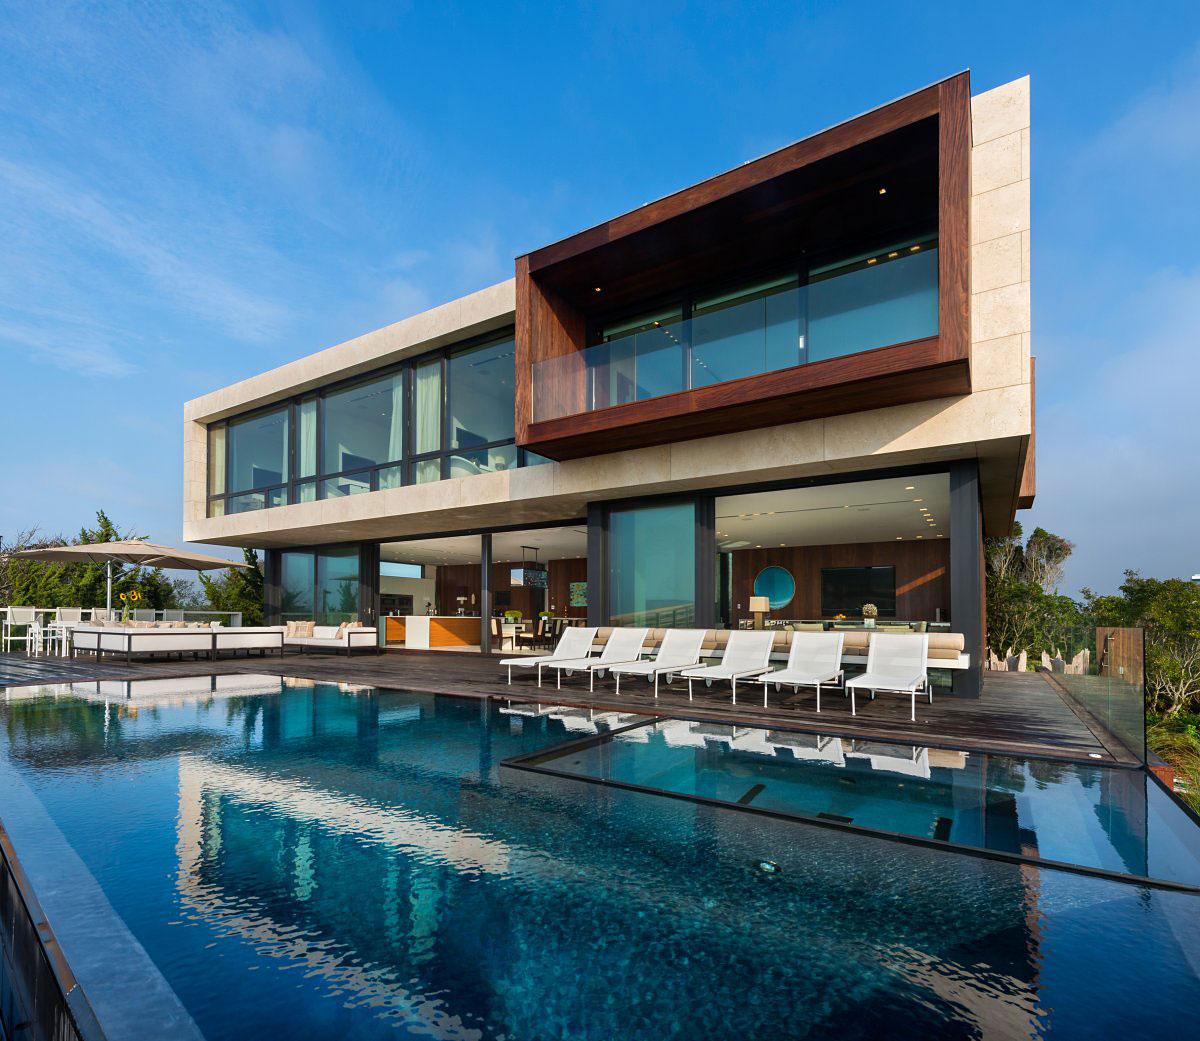 Pool, Jacuzzi, Terrace, Oceanfront Home in Sagaponack, New York